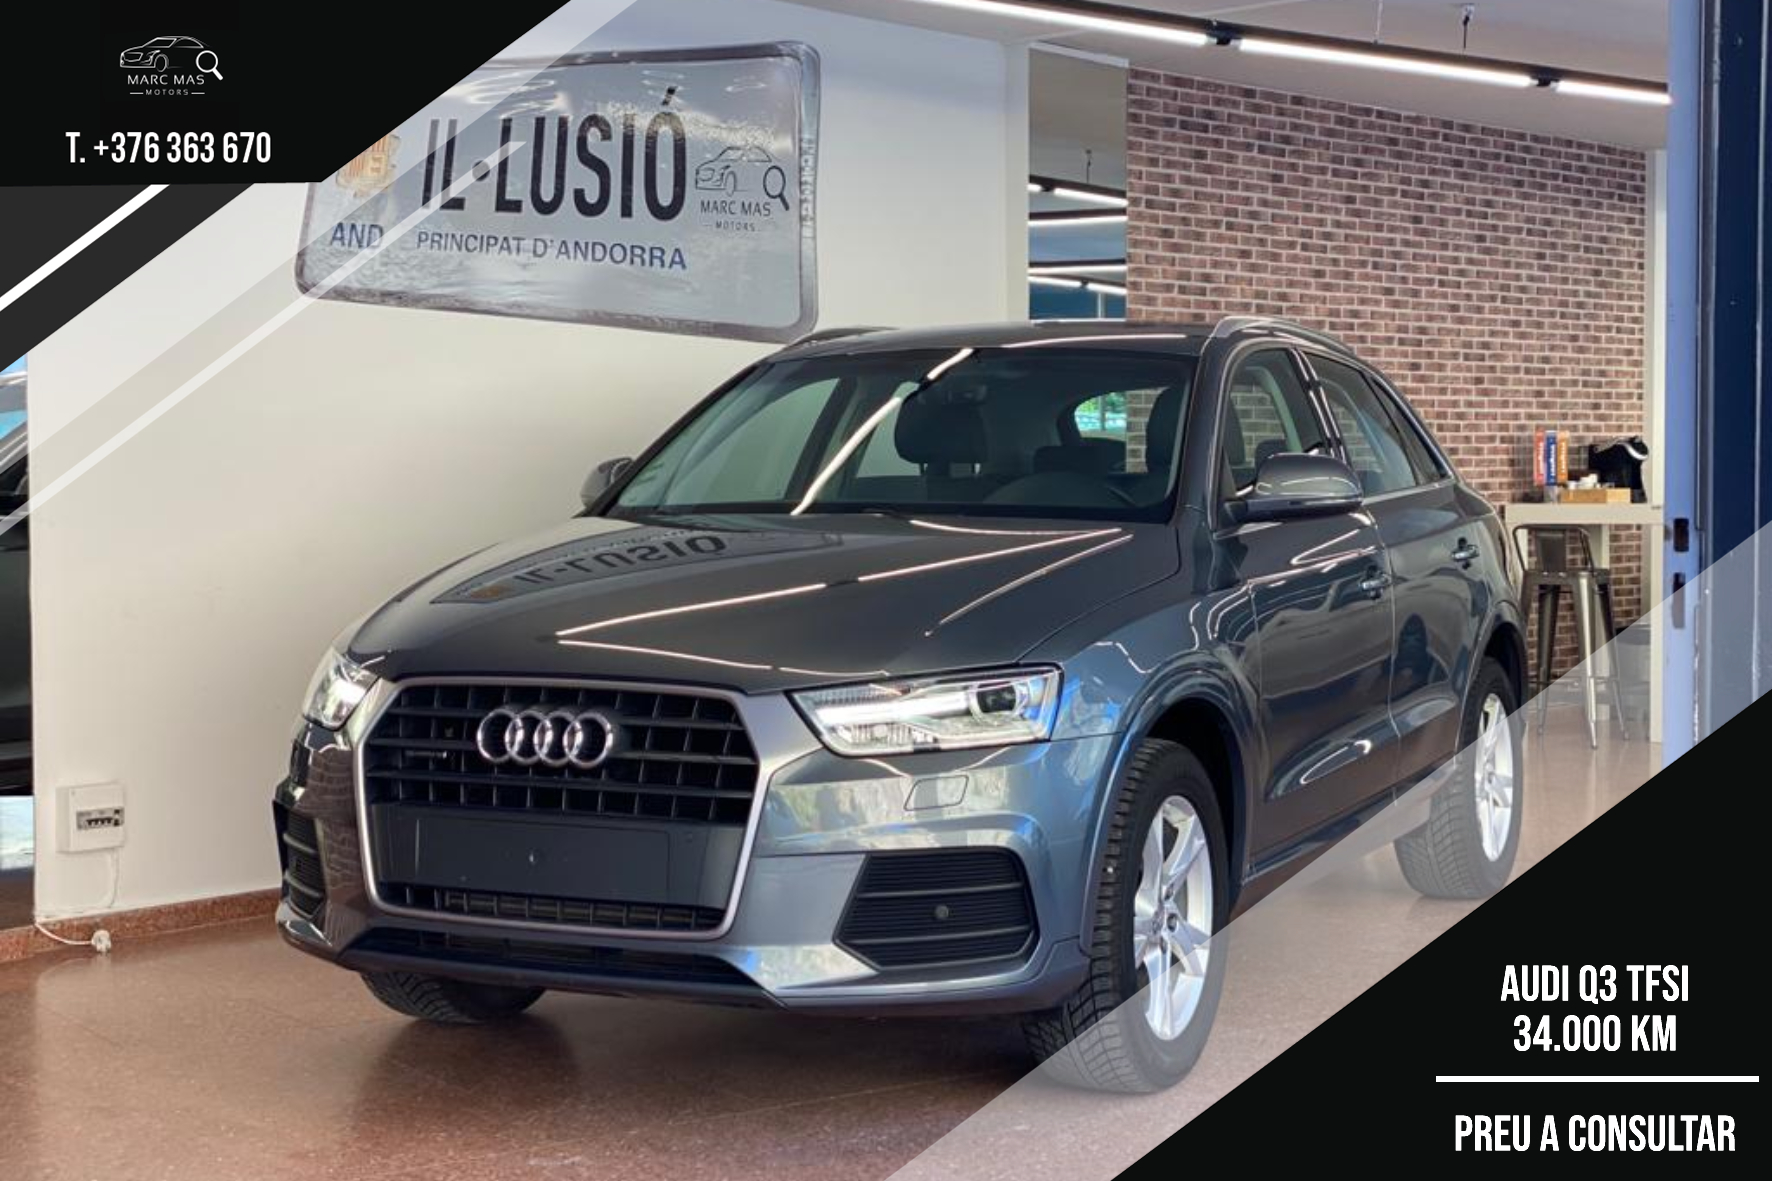 Audi - Q3 - 2.0 TSI QUATTRO   A Consultar